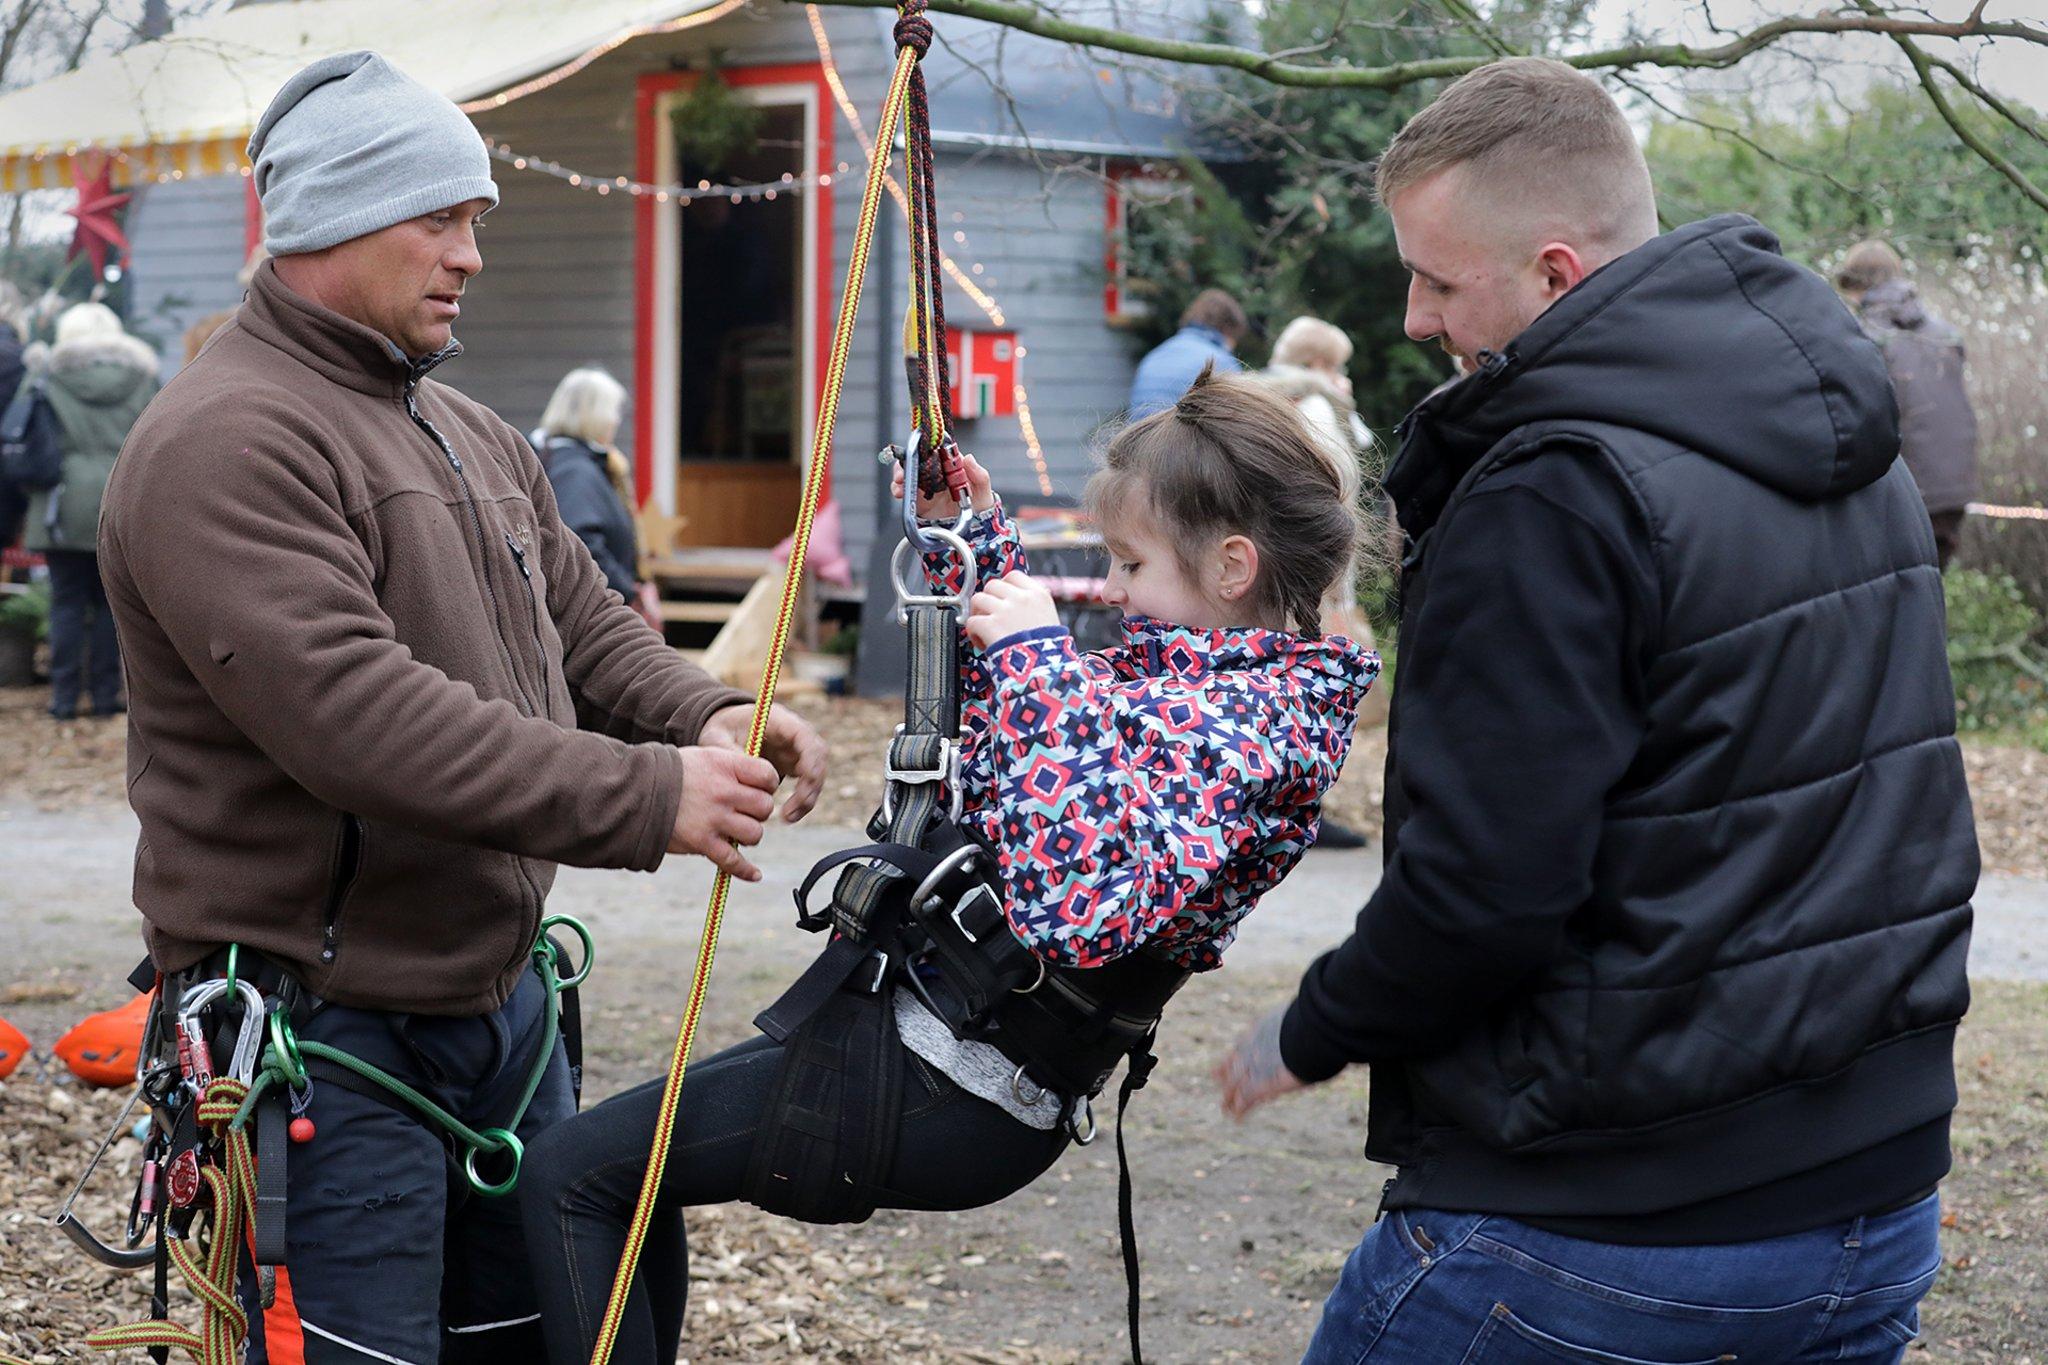 Klettergurt Ratgeber : Markt im schlosspark: cappenberg strahlt weihnachtszauber lünen